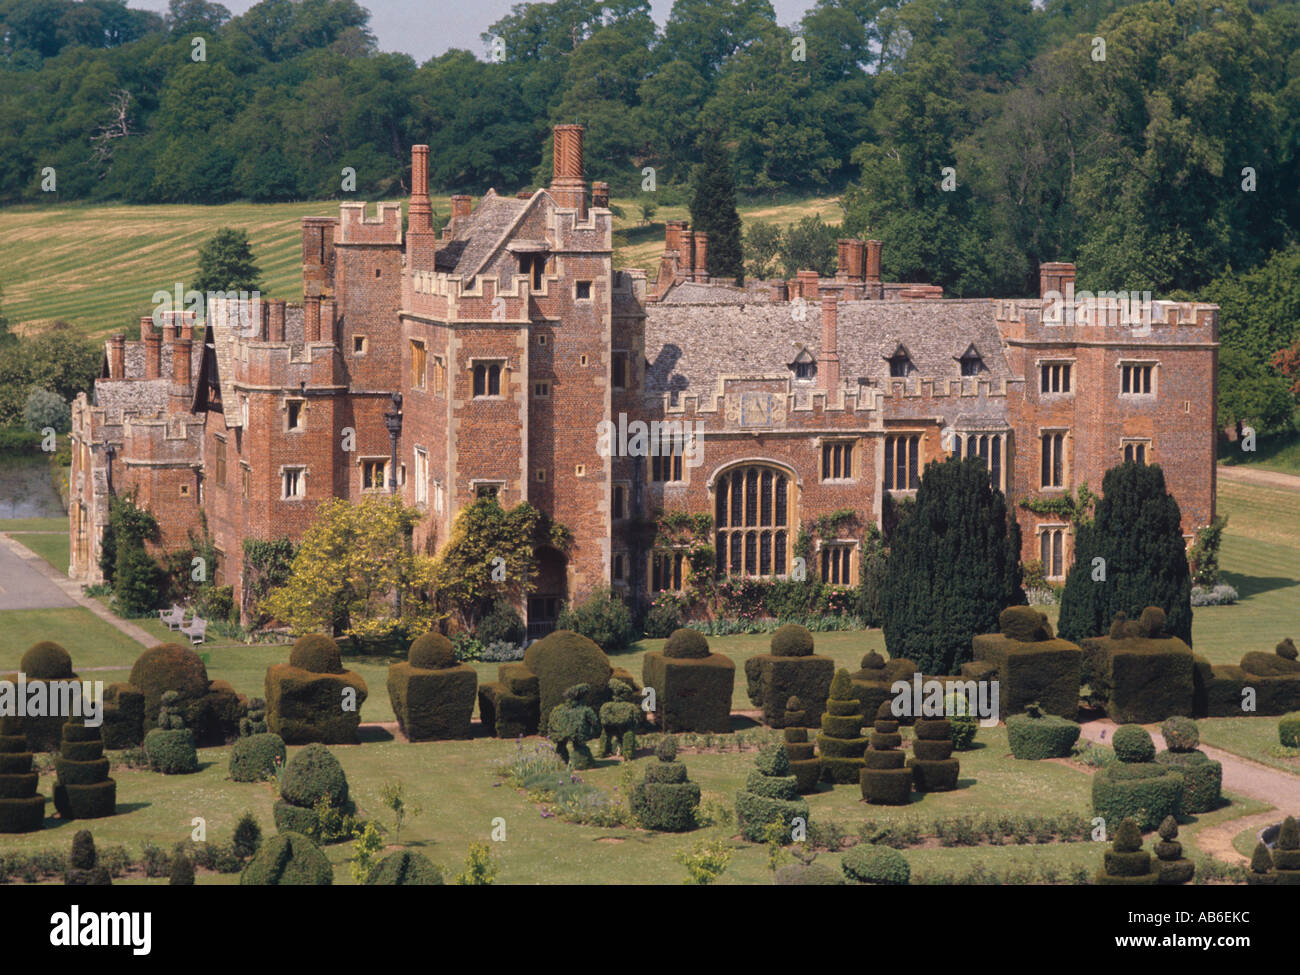 Stone Tudor House compton wynyates tudor pink brick manor house dates from 1480 fine